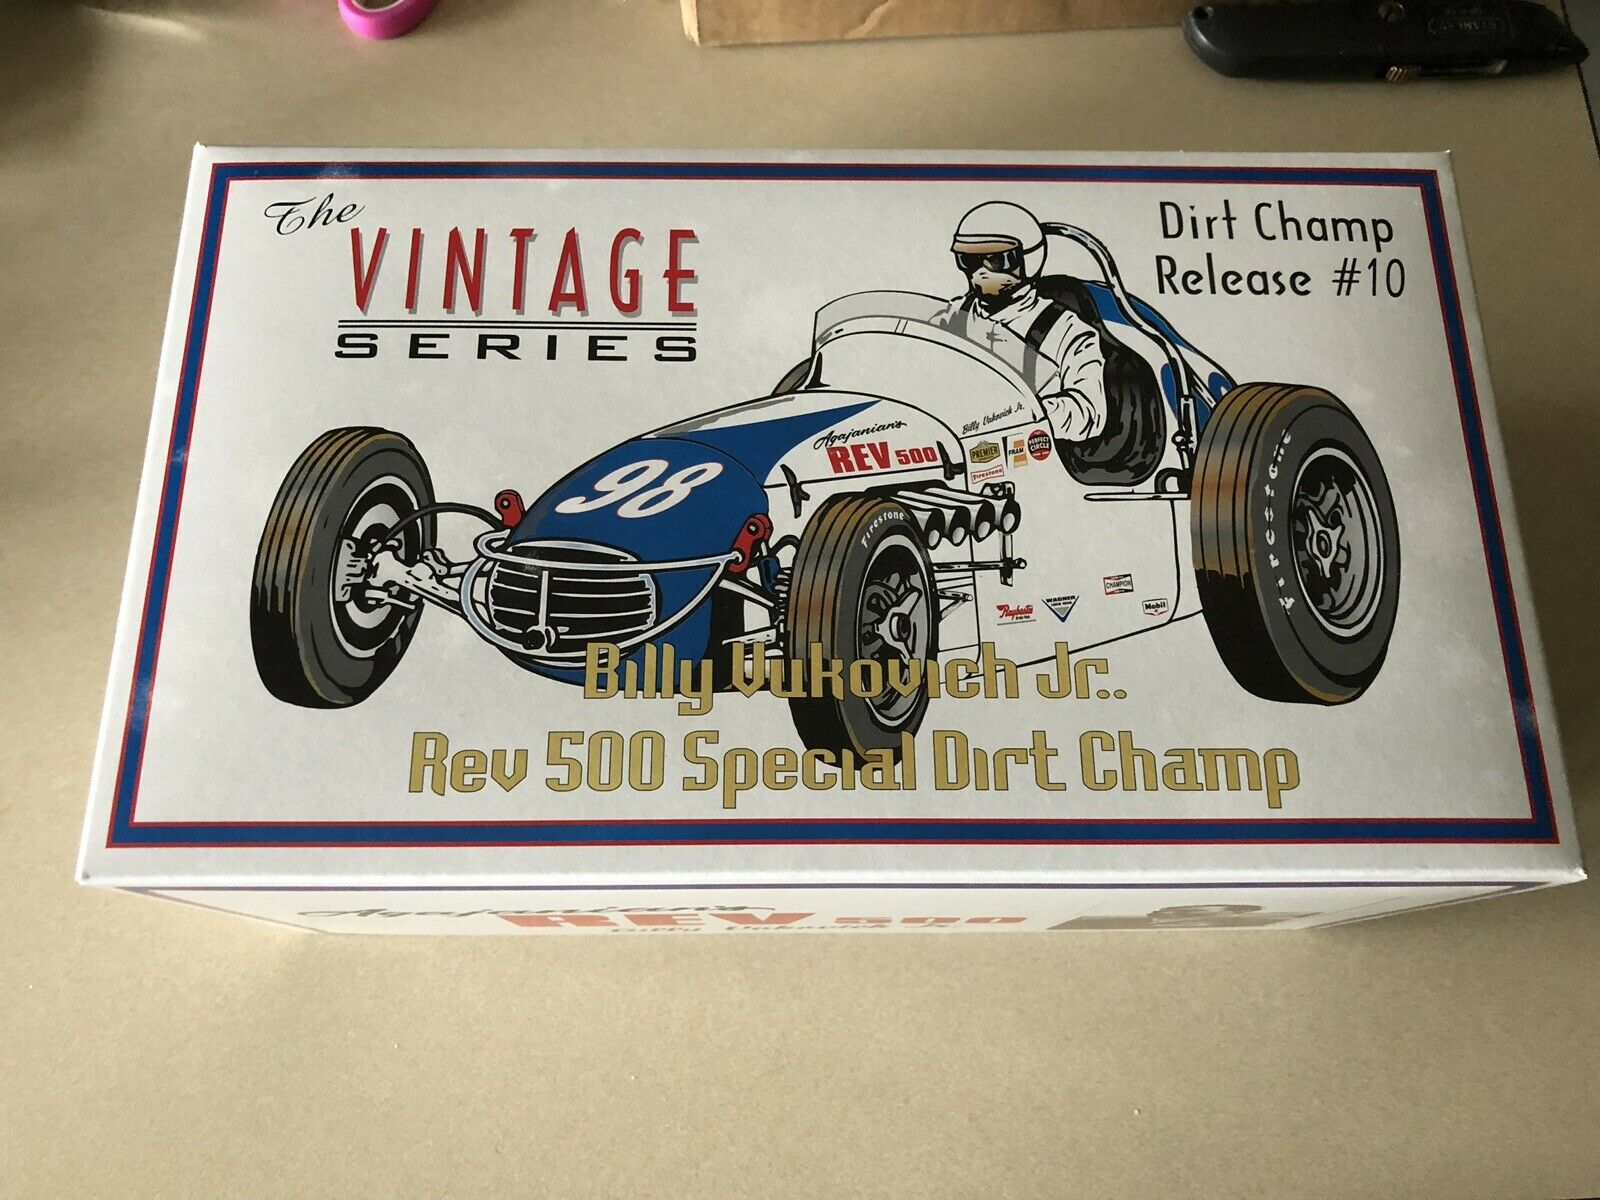 GMP Billy yukovich Jr. REV 500 Special Dirt Champ